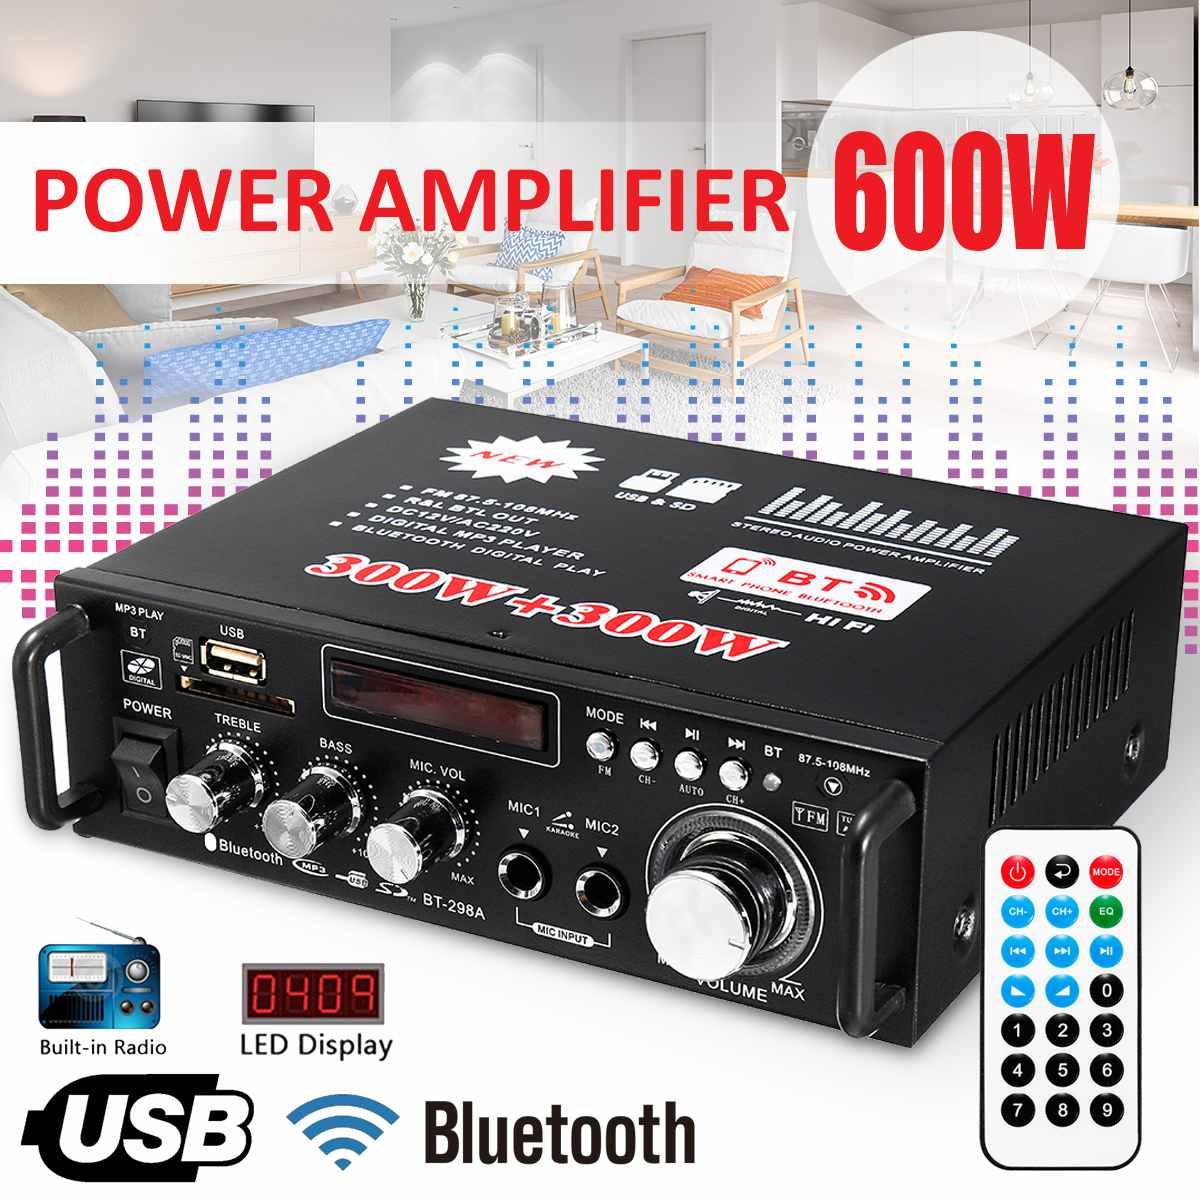 12V 220V 2CH 600W pantalla LCD Digital HIFI Audio amplificador de potencia bluetooth FM Radio coche hogar Subwoofer estéreo con Control remoto